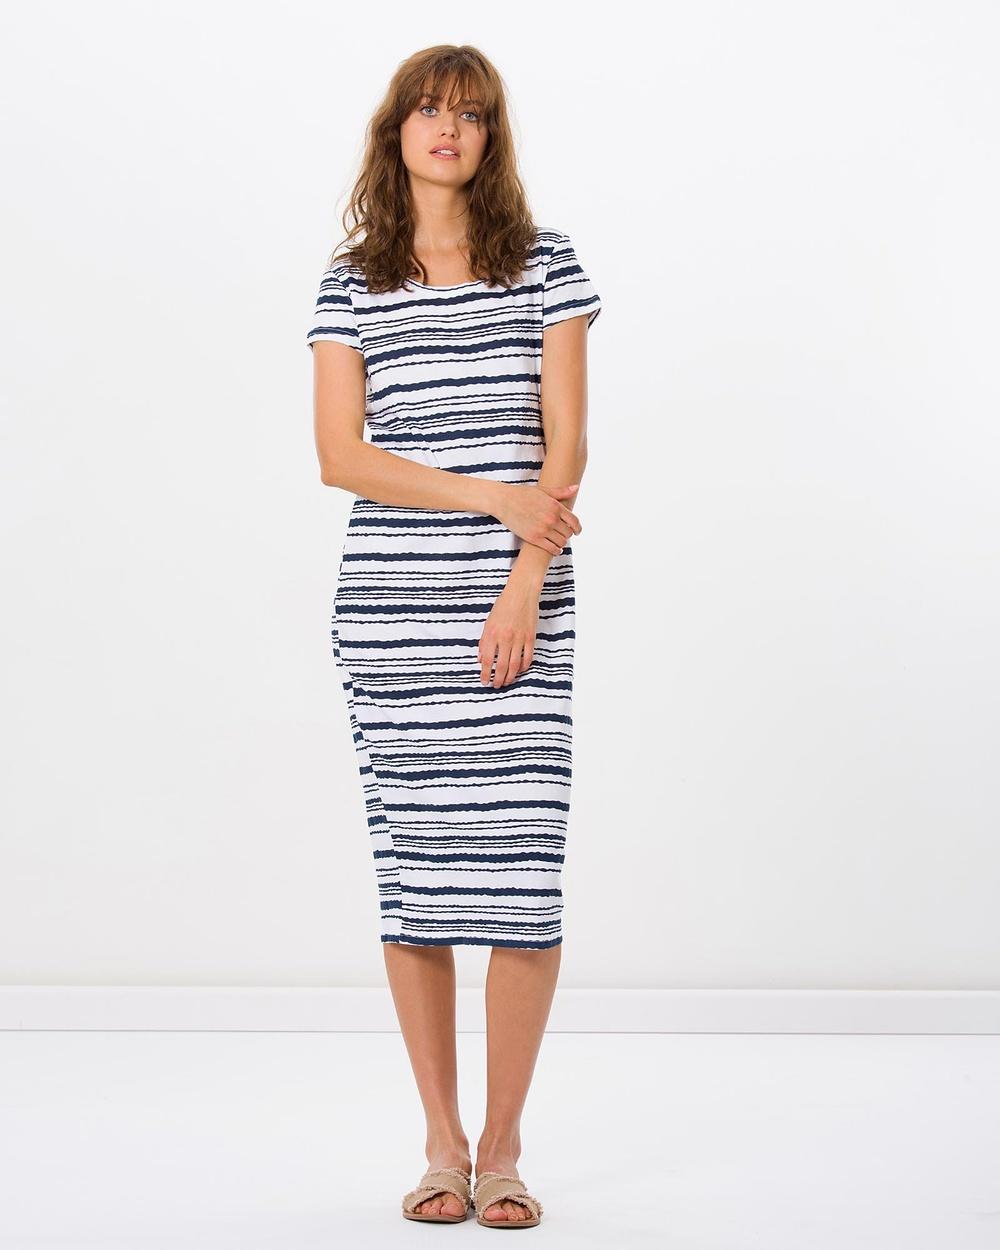 Kaja Clothing Marissa Dress Dresses Navy Stripe Marissa Dress